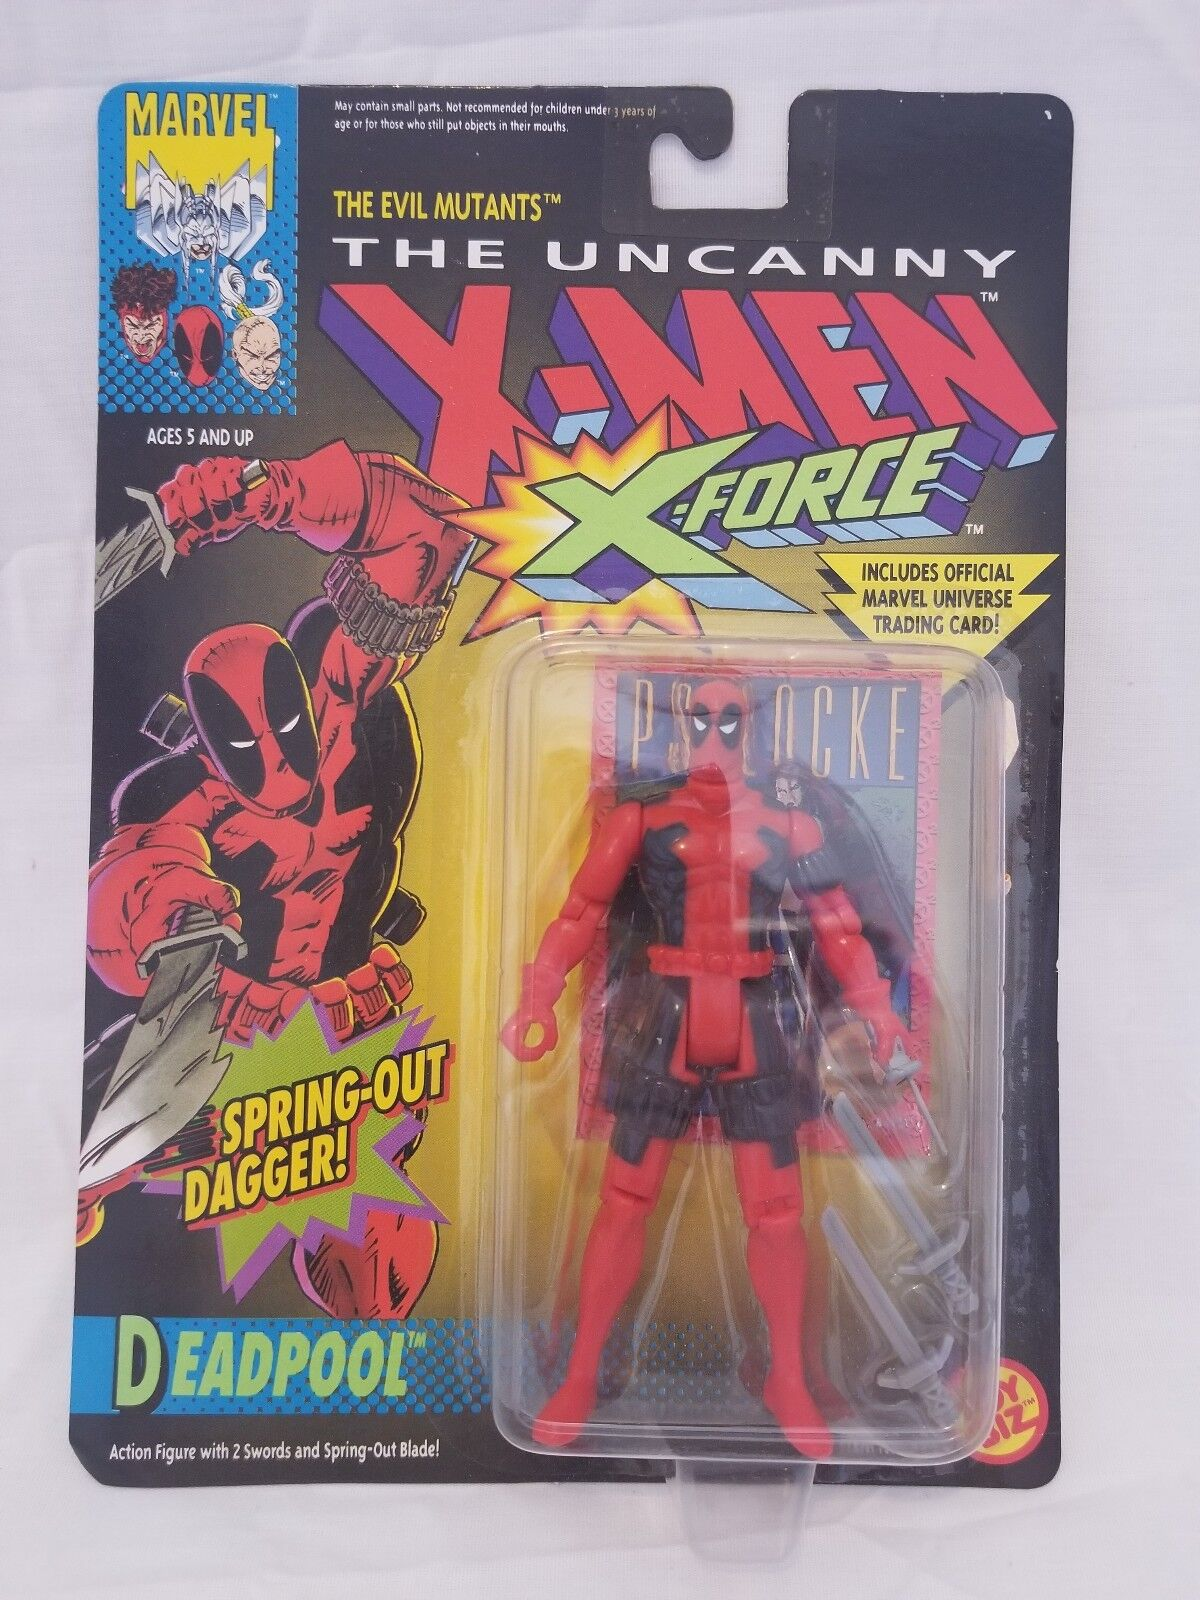 Leksakbranschen Den Uncanny X-män X-Force Deadpool Figur med Springa Out Dagger MOC